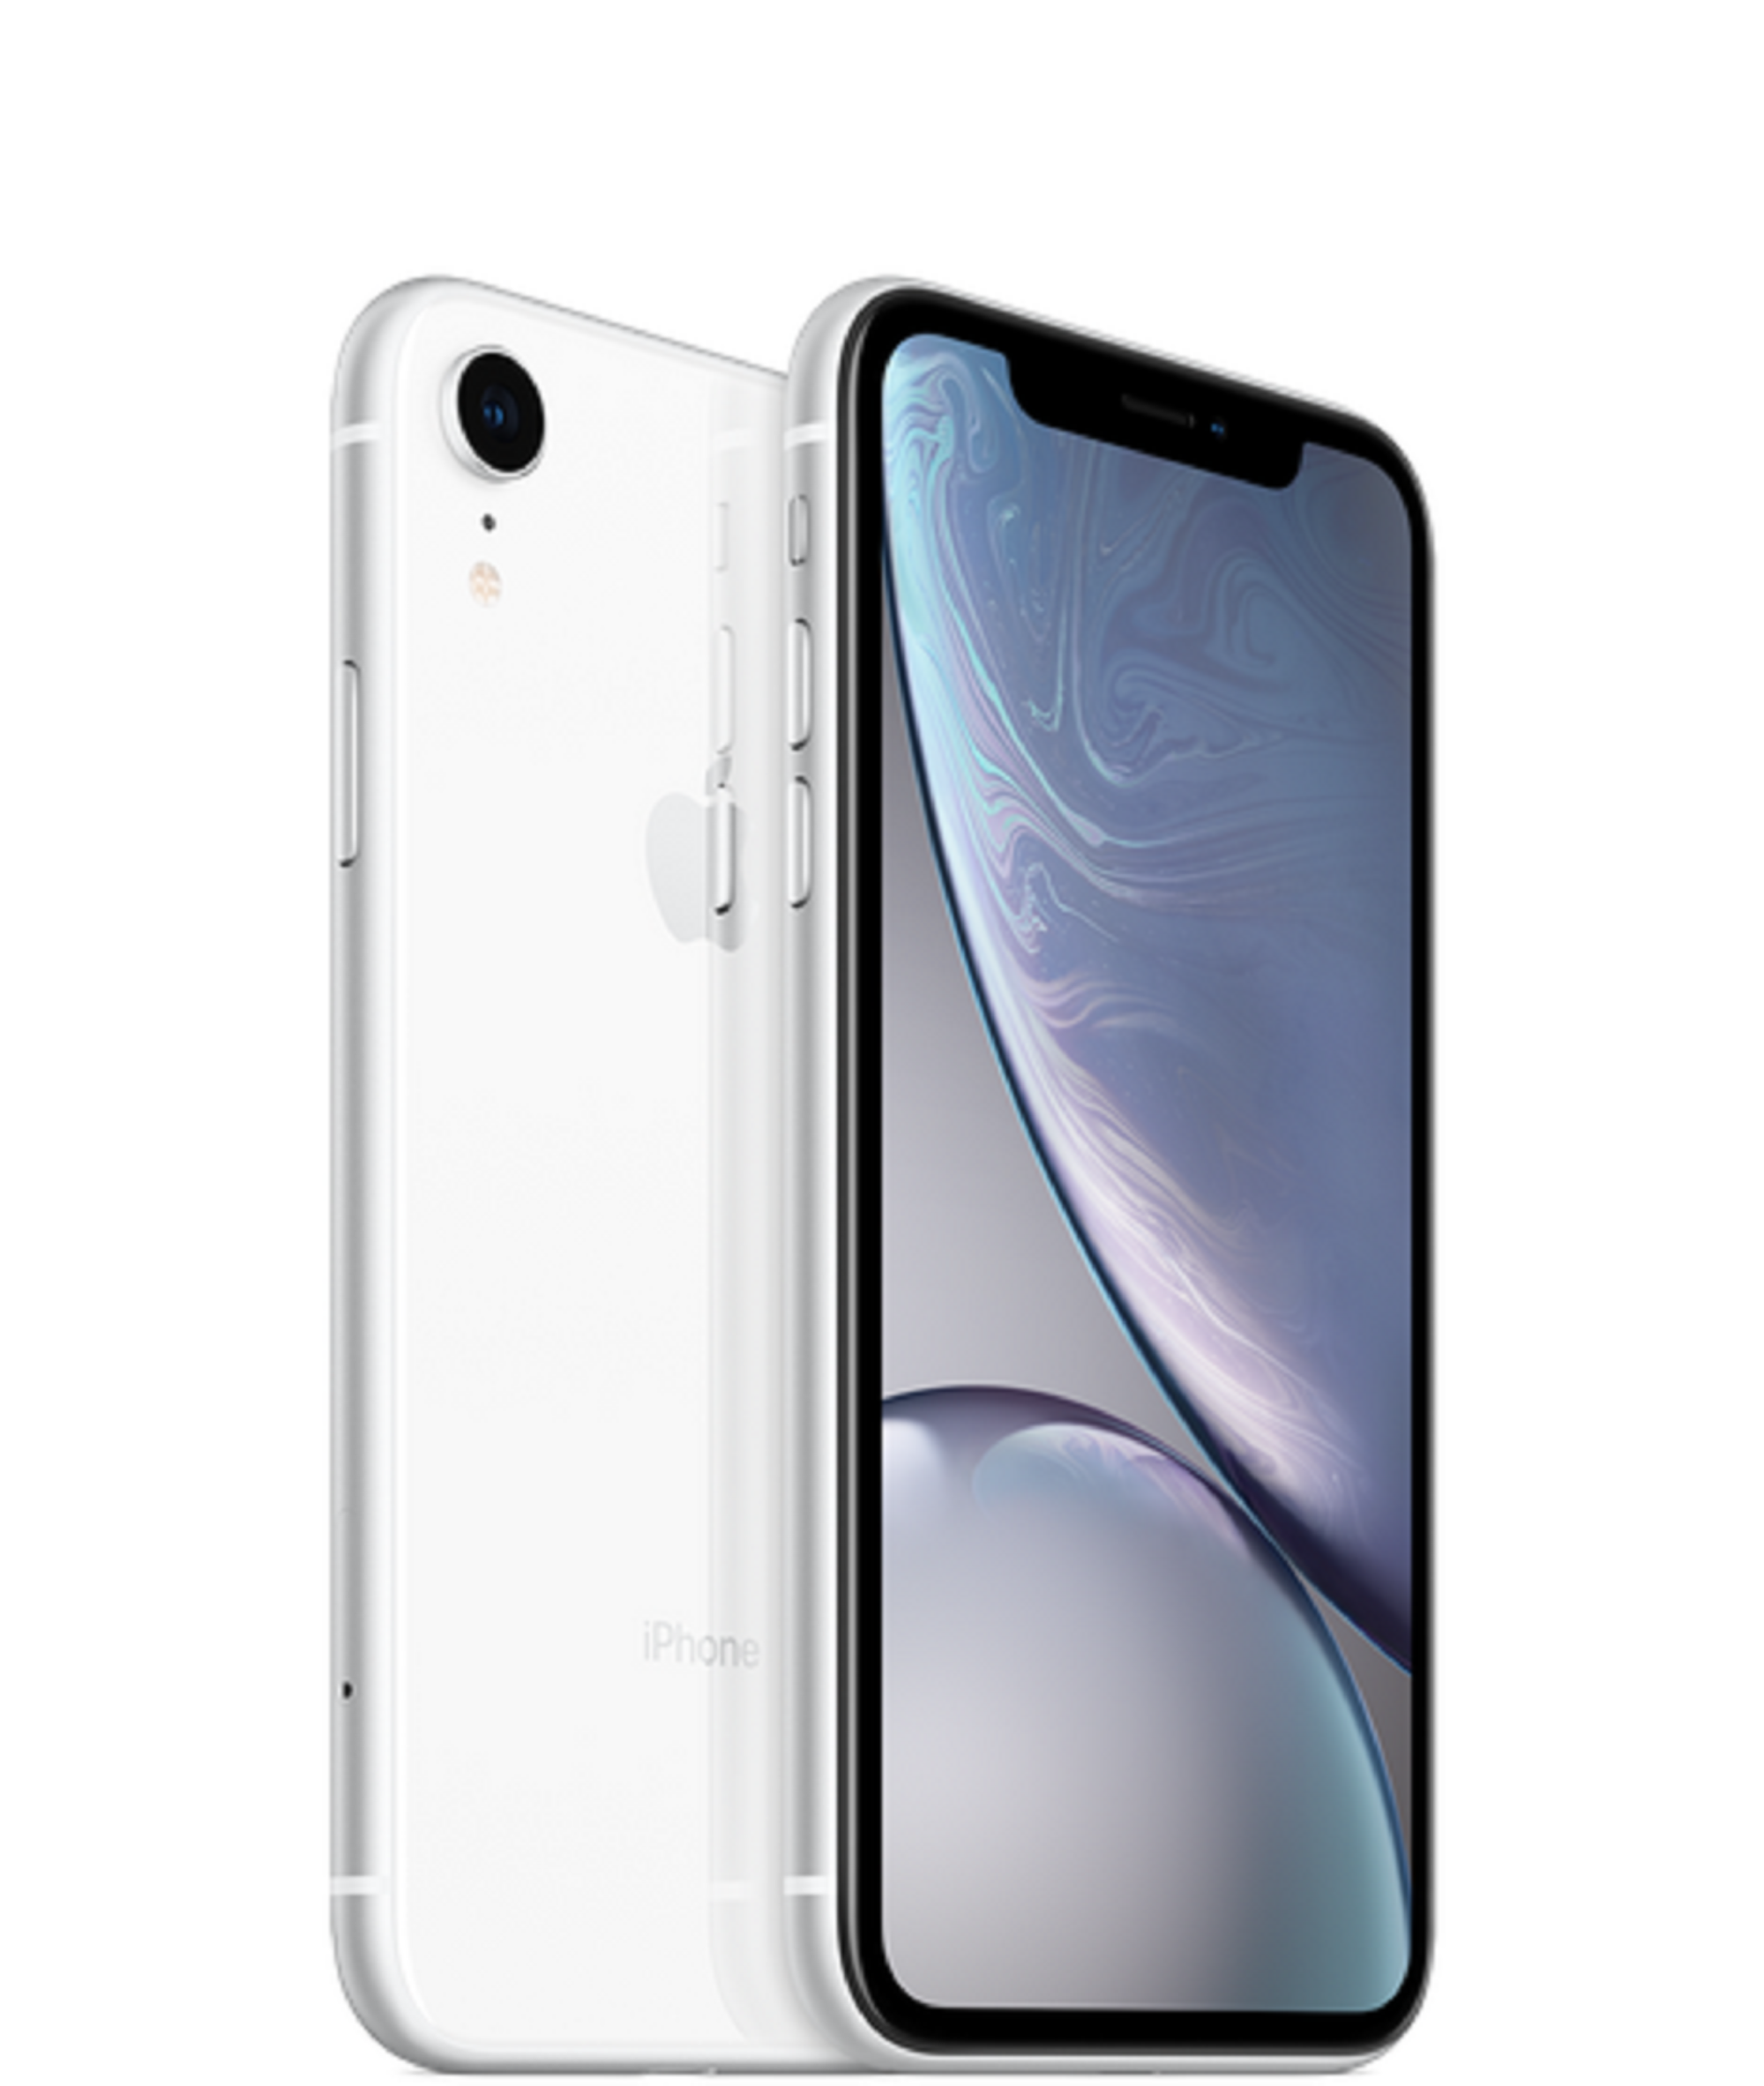 thumbnail 22 - Apple iPhone XR 64GB Factory Unlocked Smartphone 4G LTE iOS Smartphone